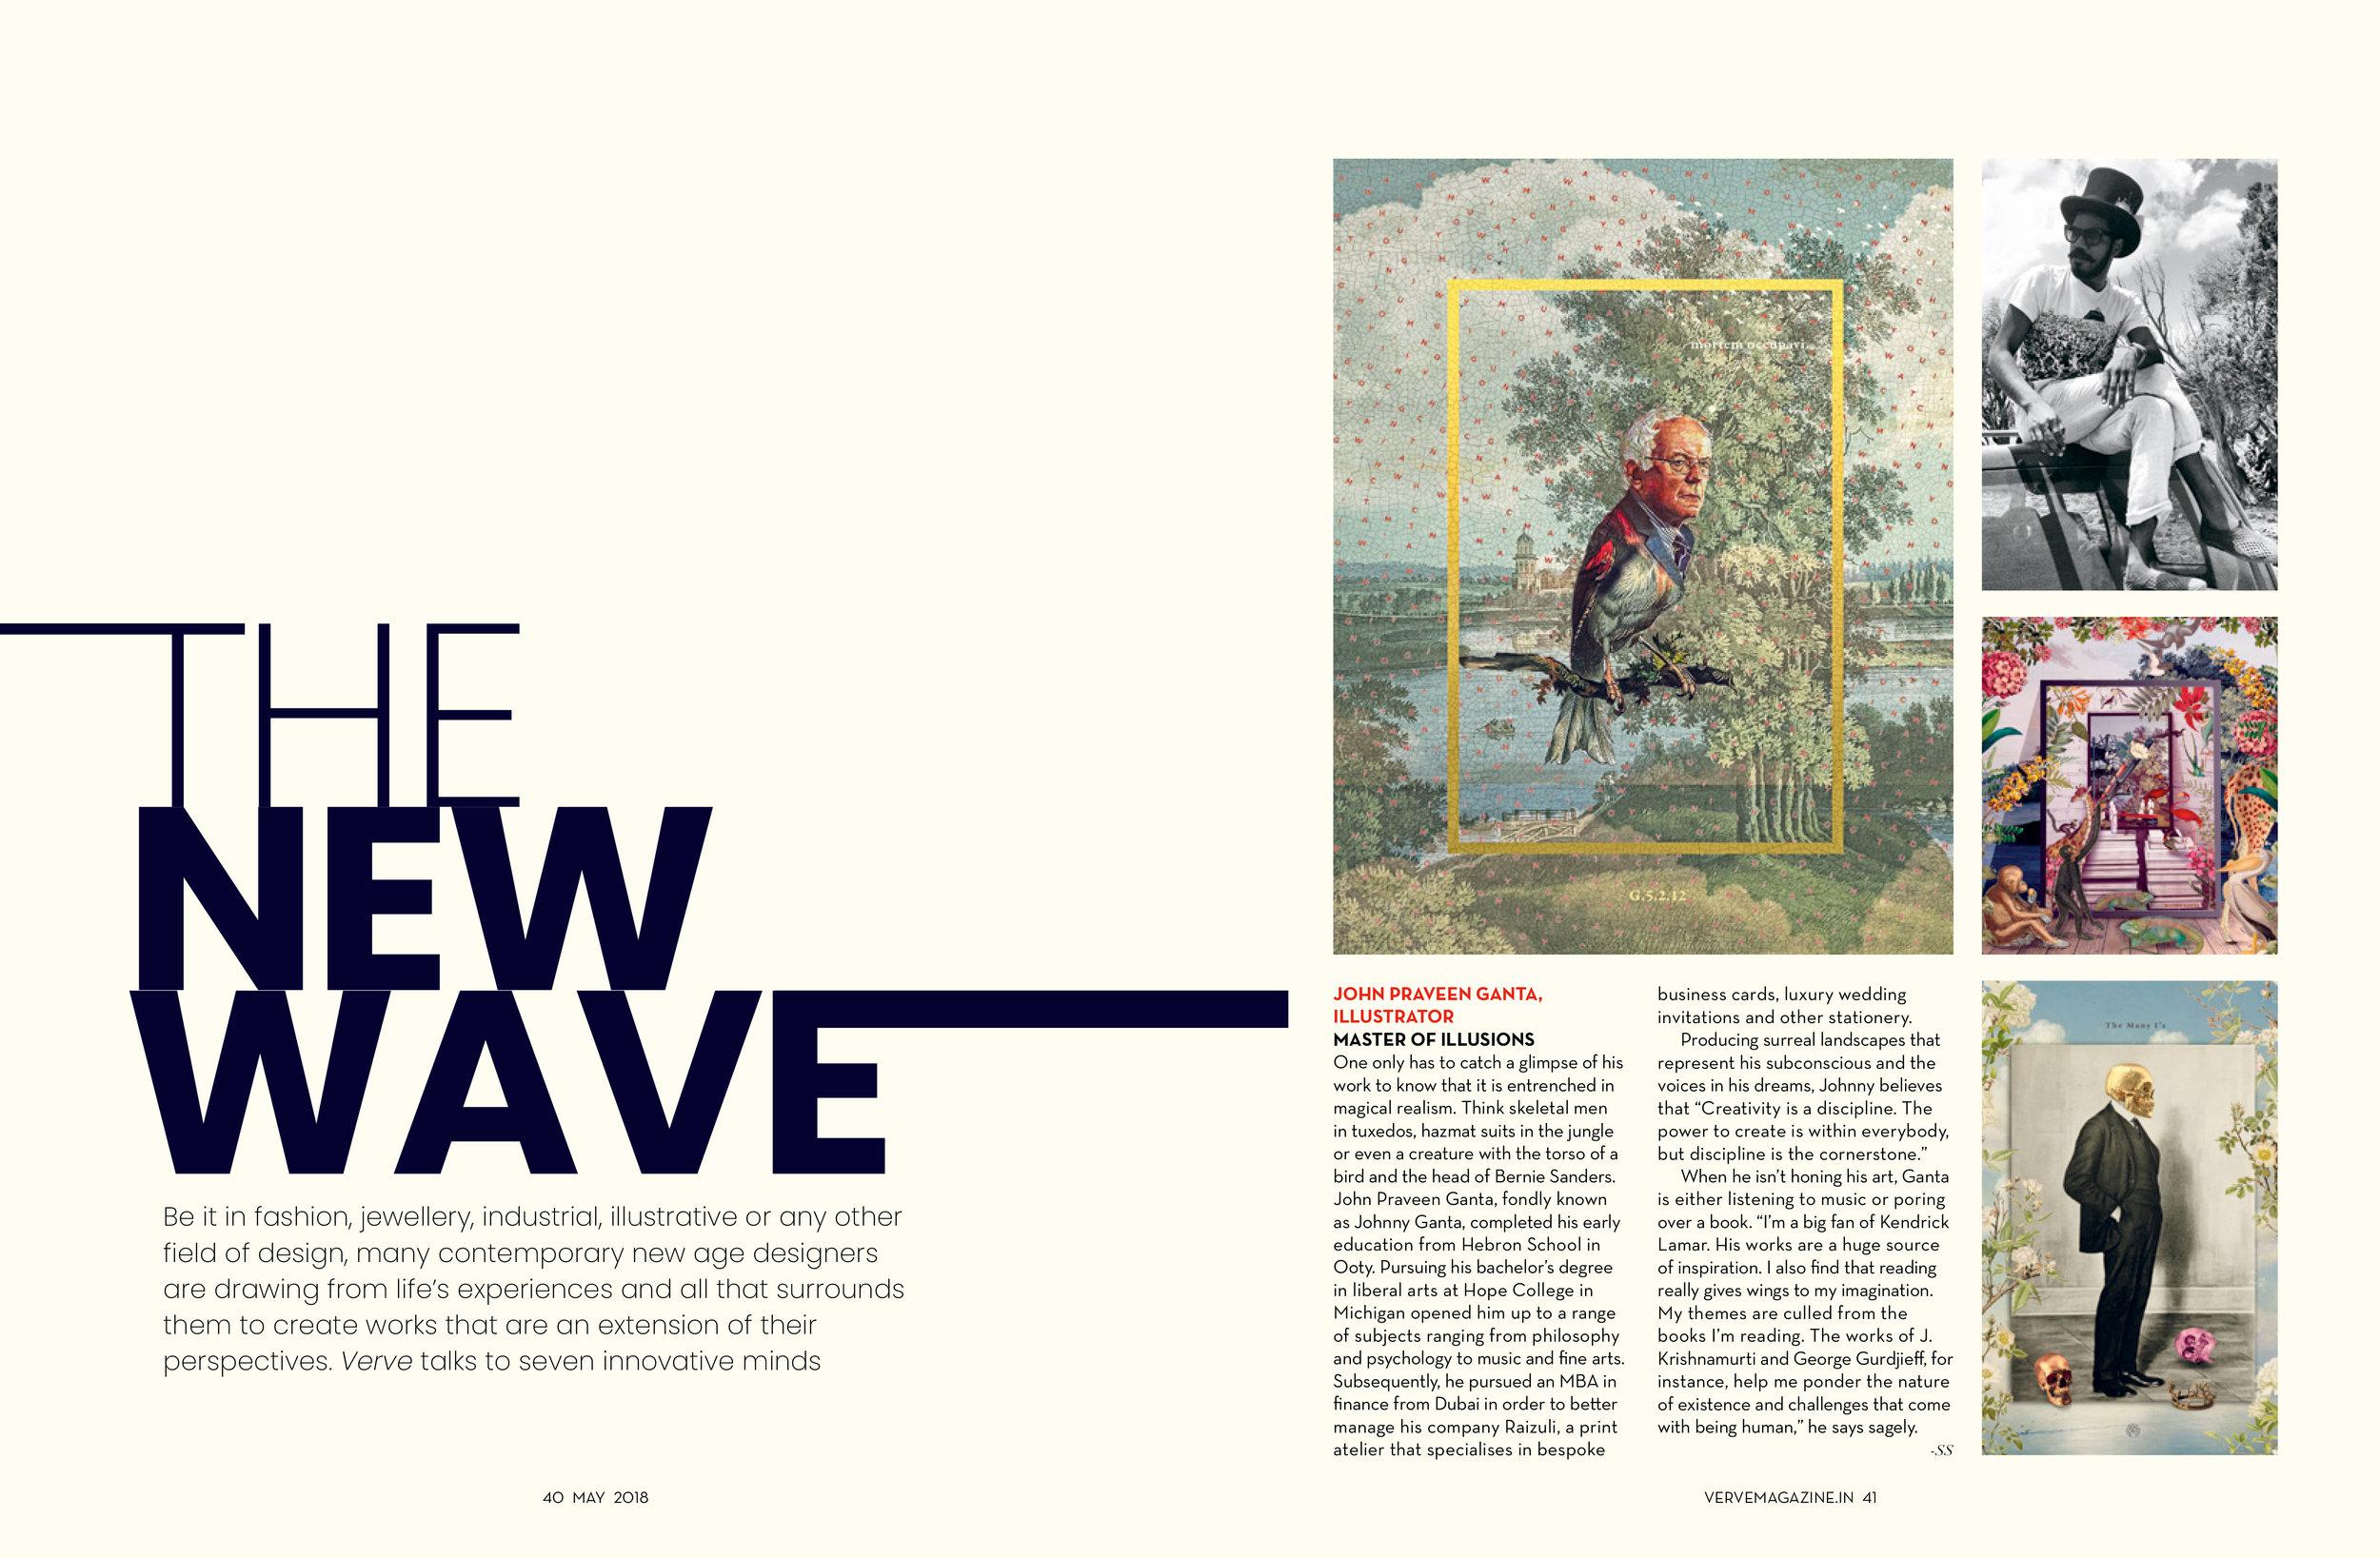 New-wave designers-1.jpg